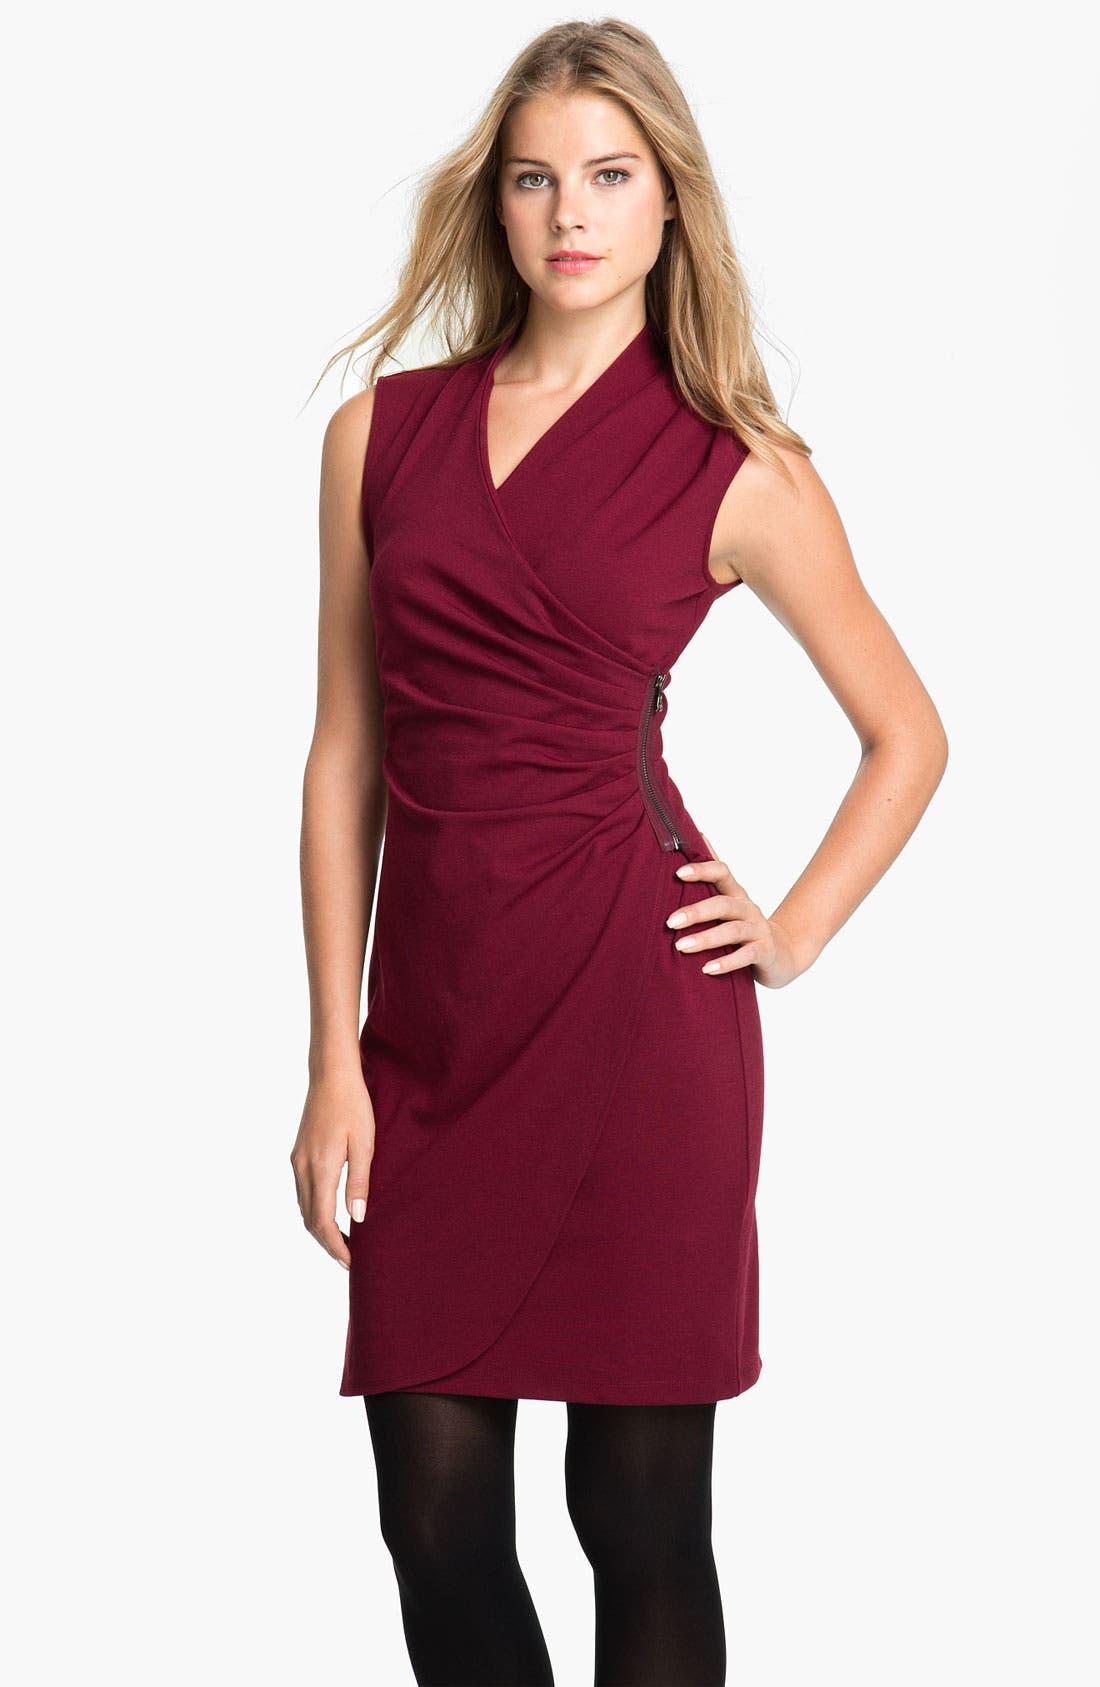 Alternate Image 1 Selected - Kenneth Cole New York 'Lindsey' Ponte Dress (Petite)